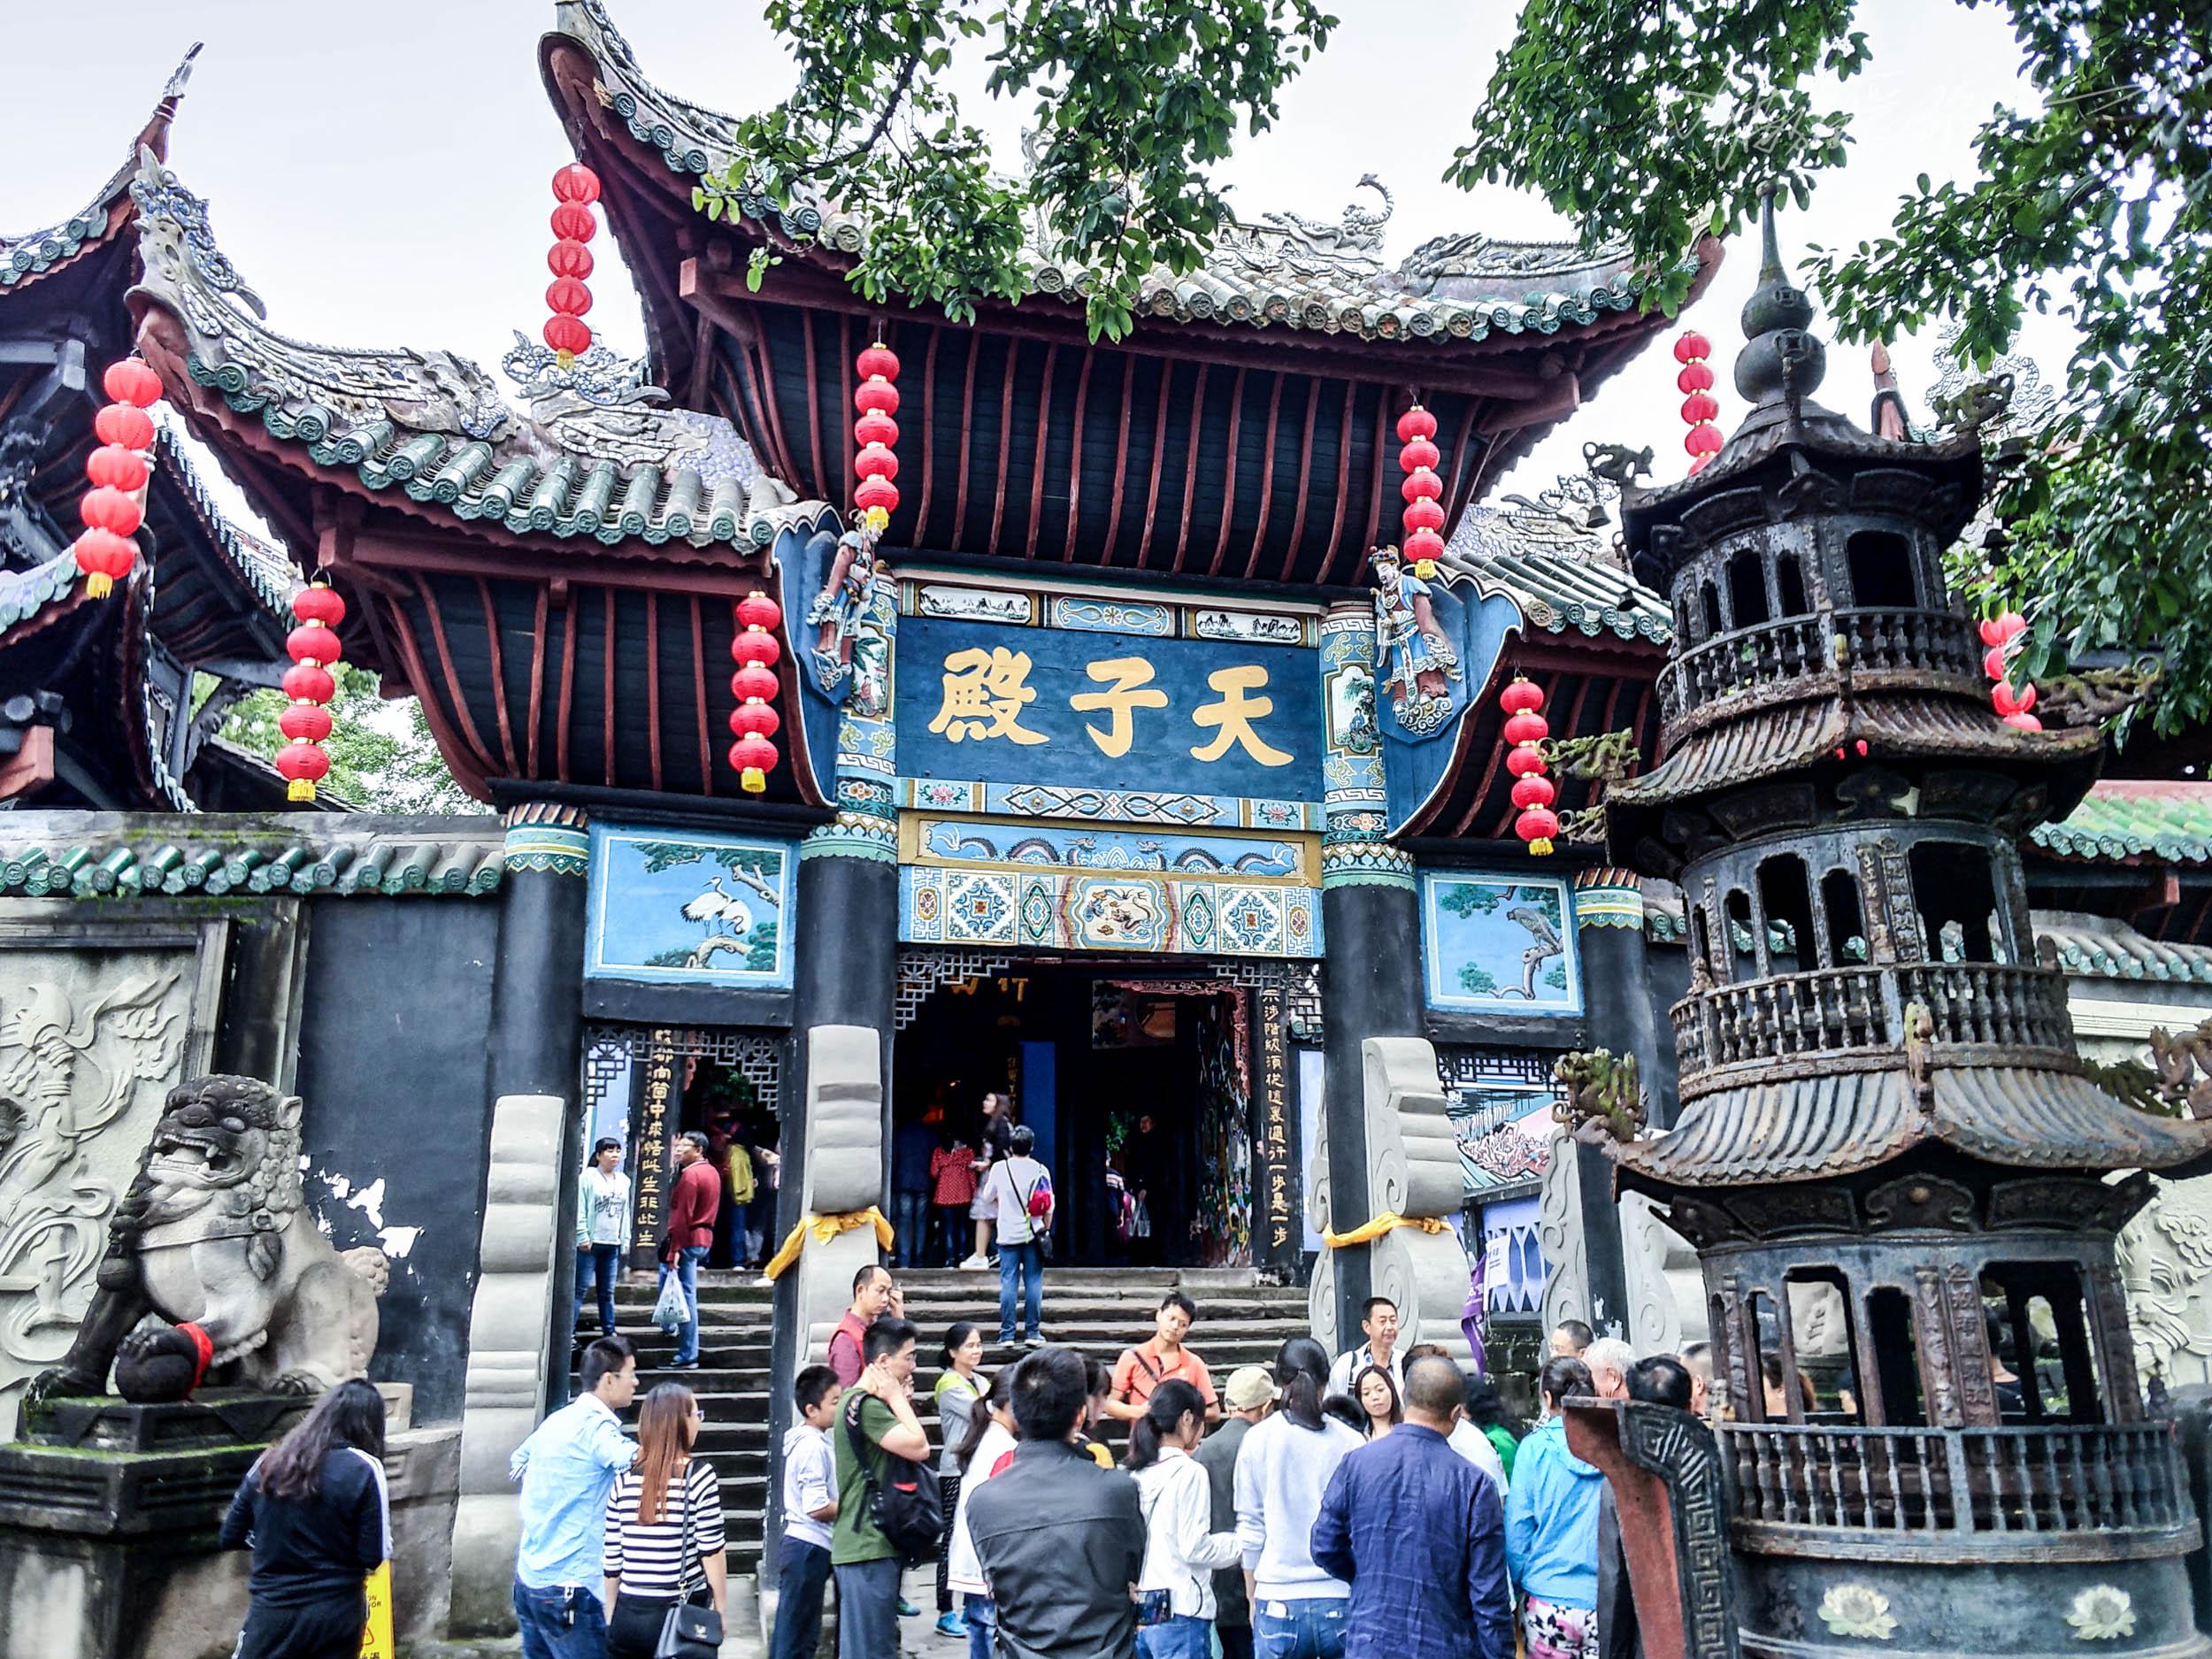 yangtze river cruise Fengdu Ghost City